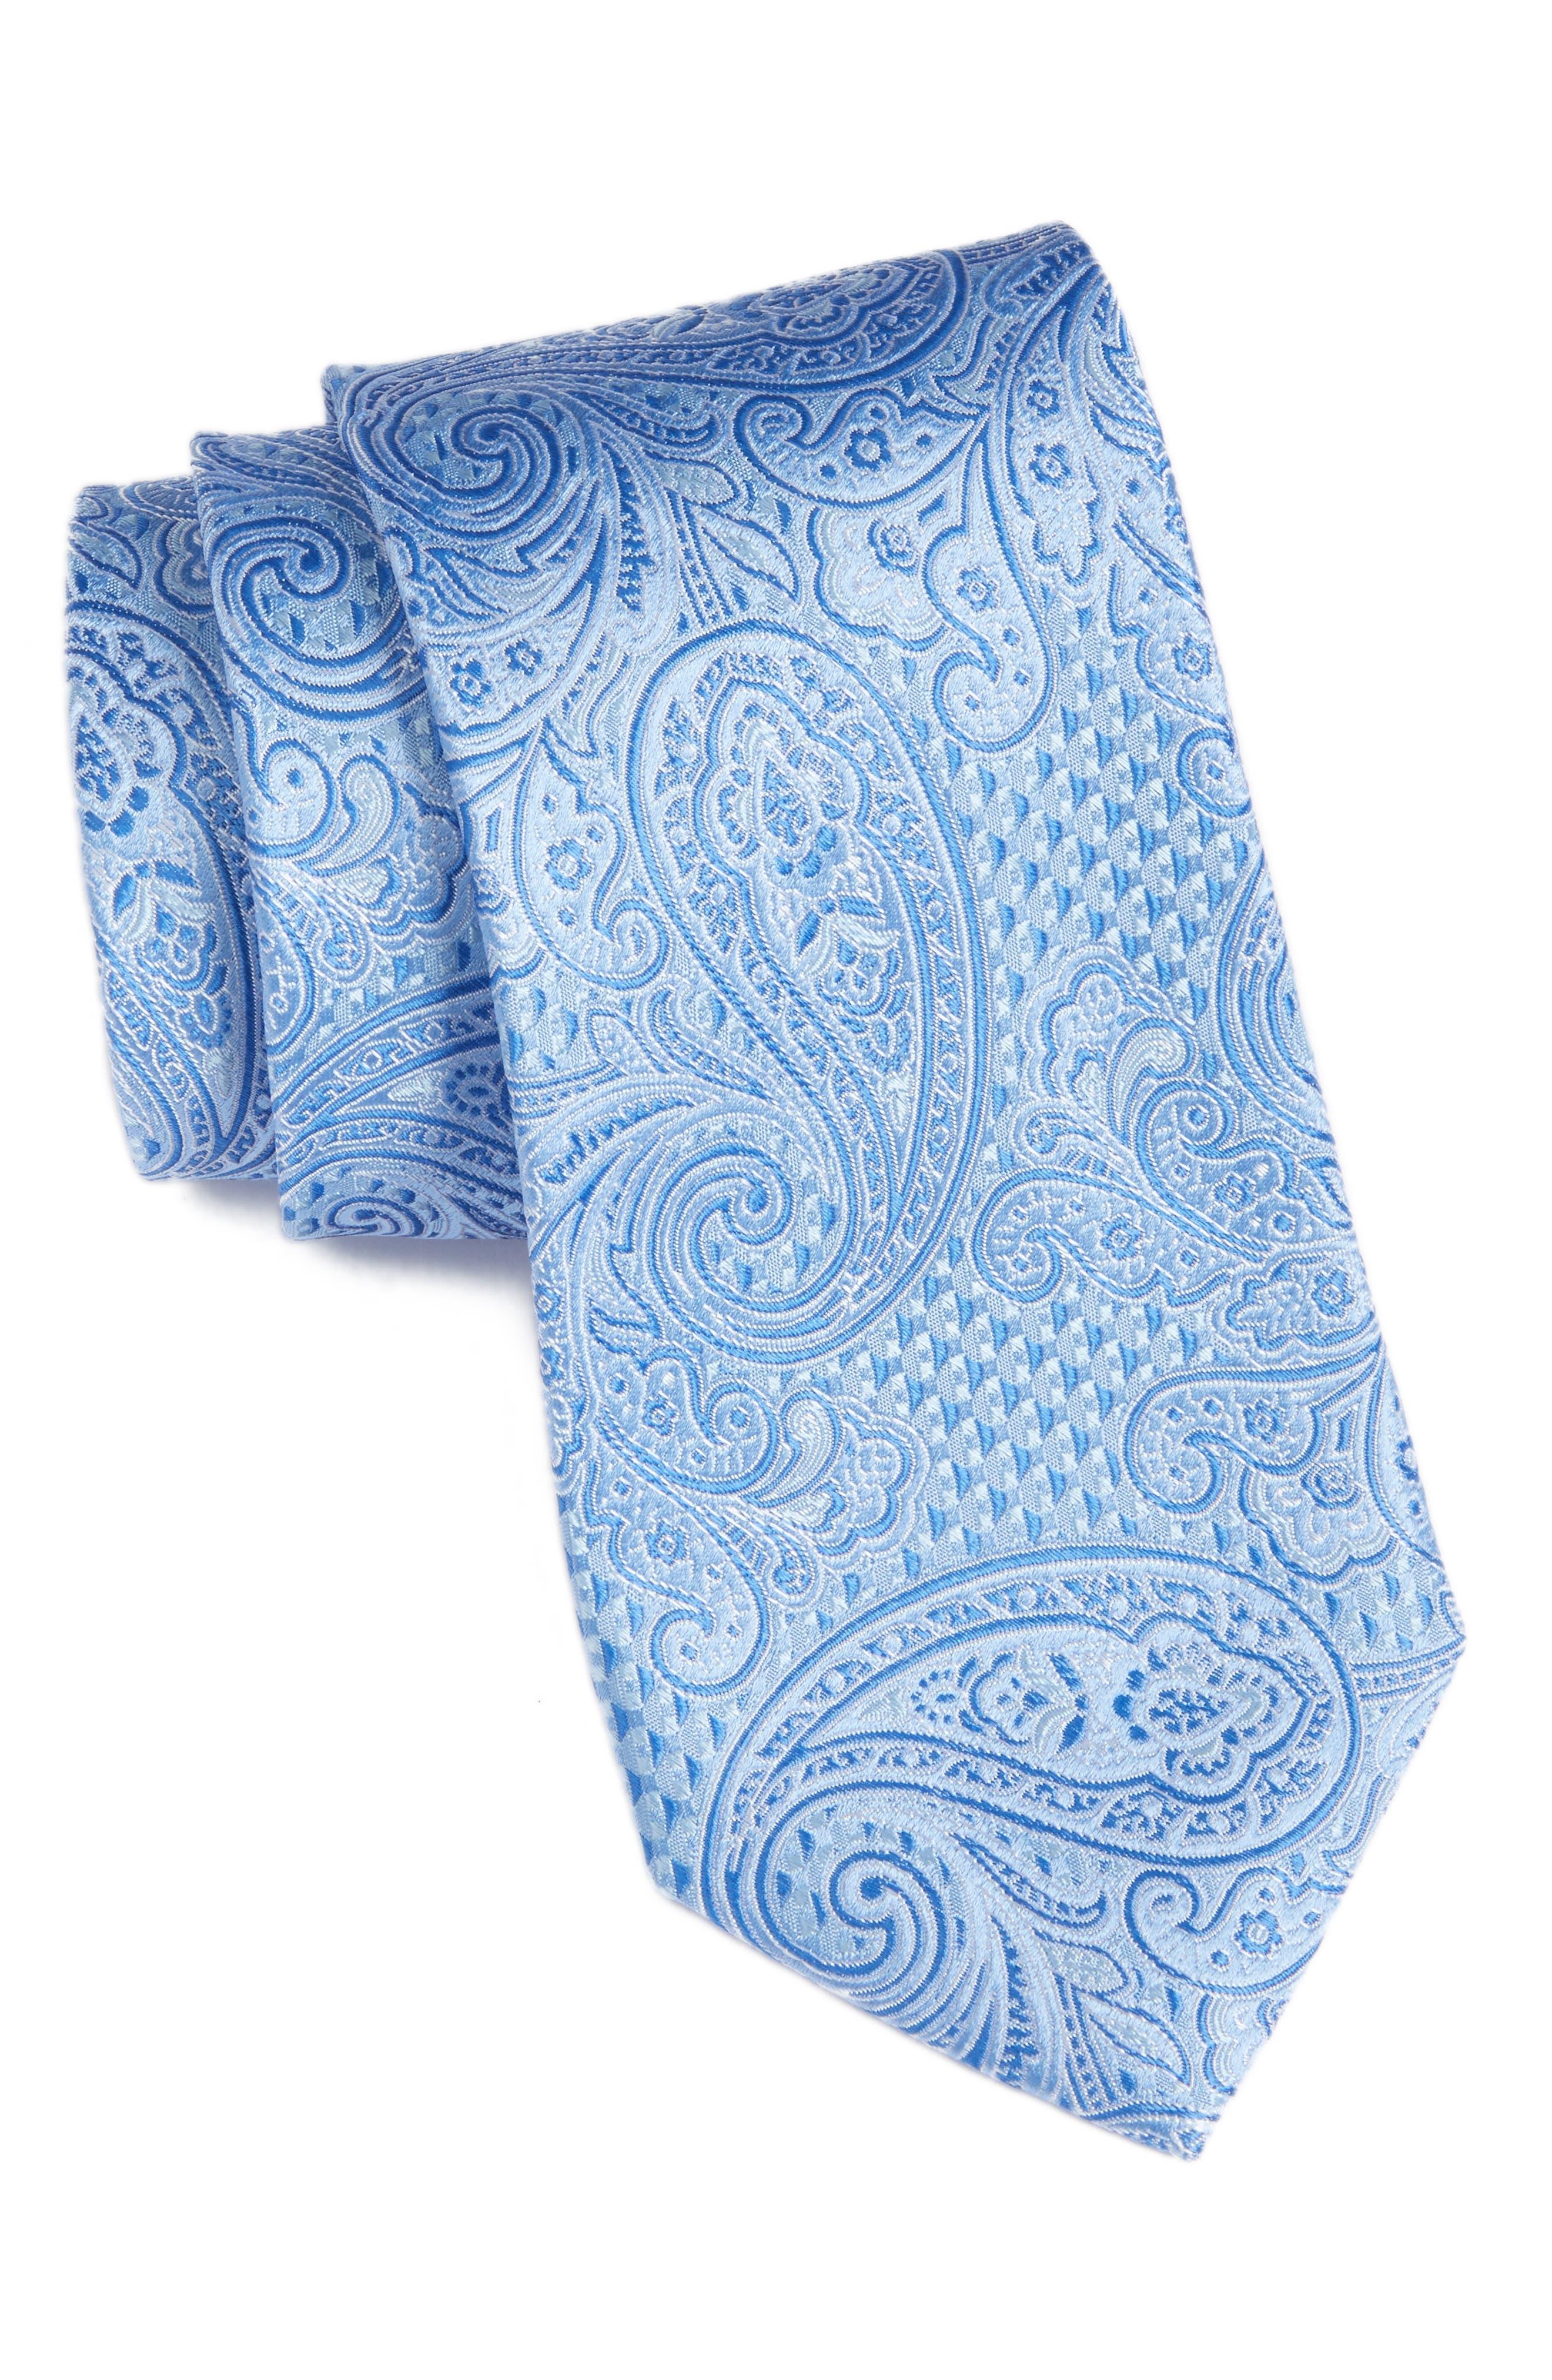 Nordstrom Men's Shop Sovana Paisley Silk Tie